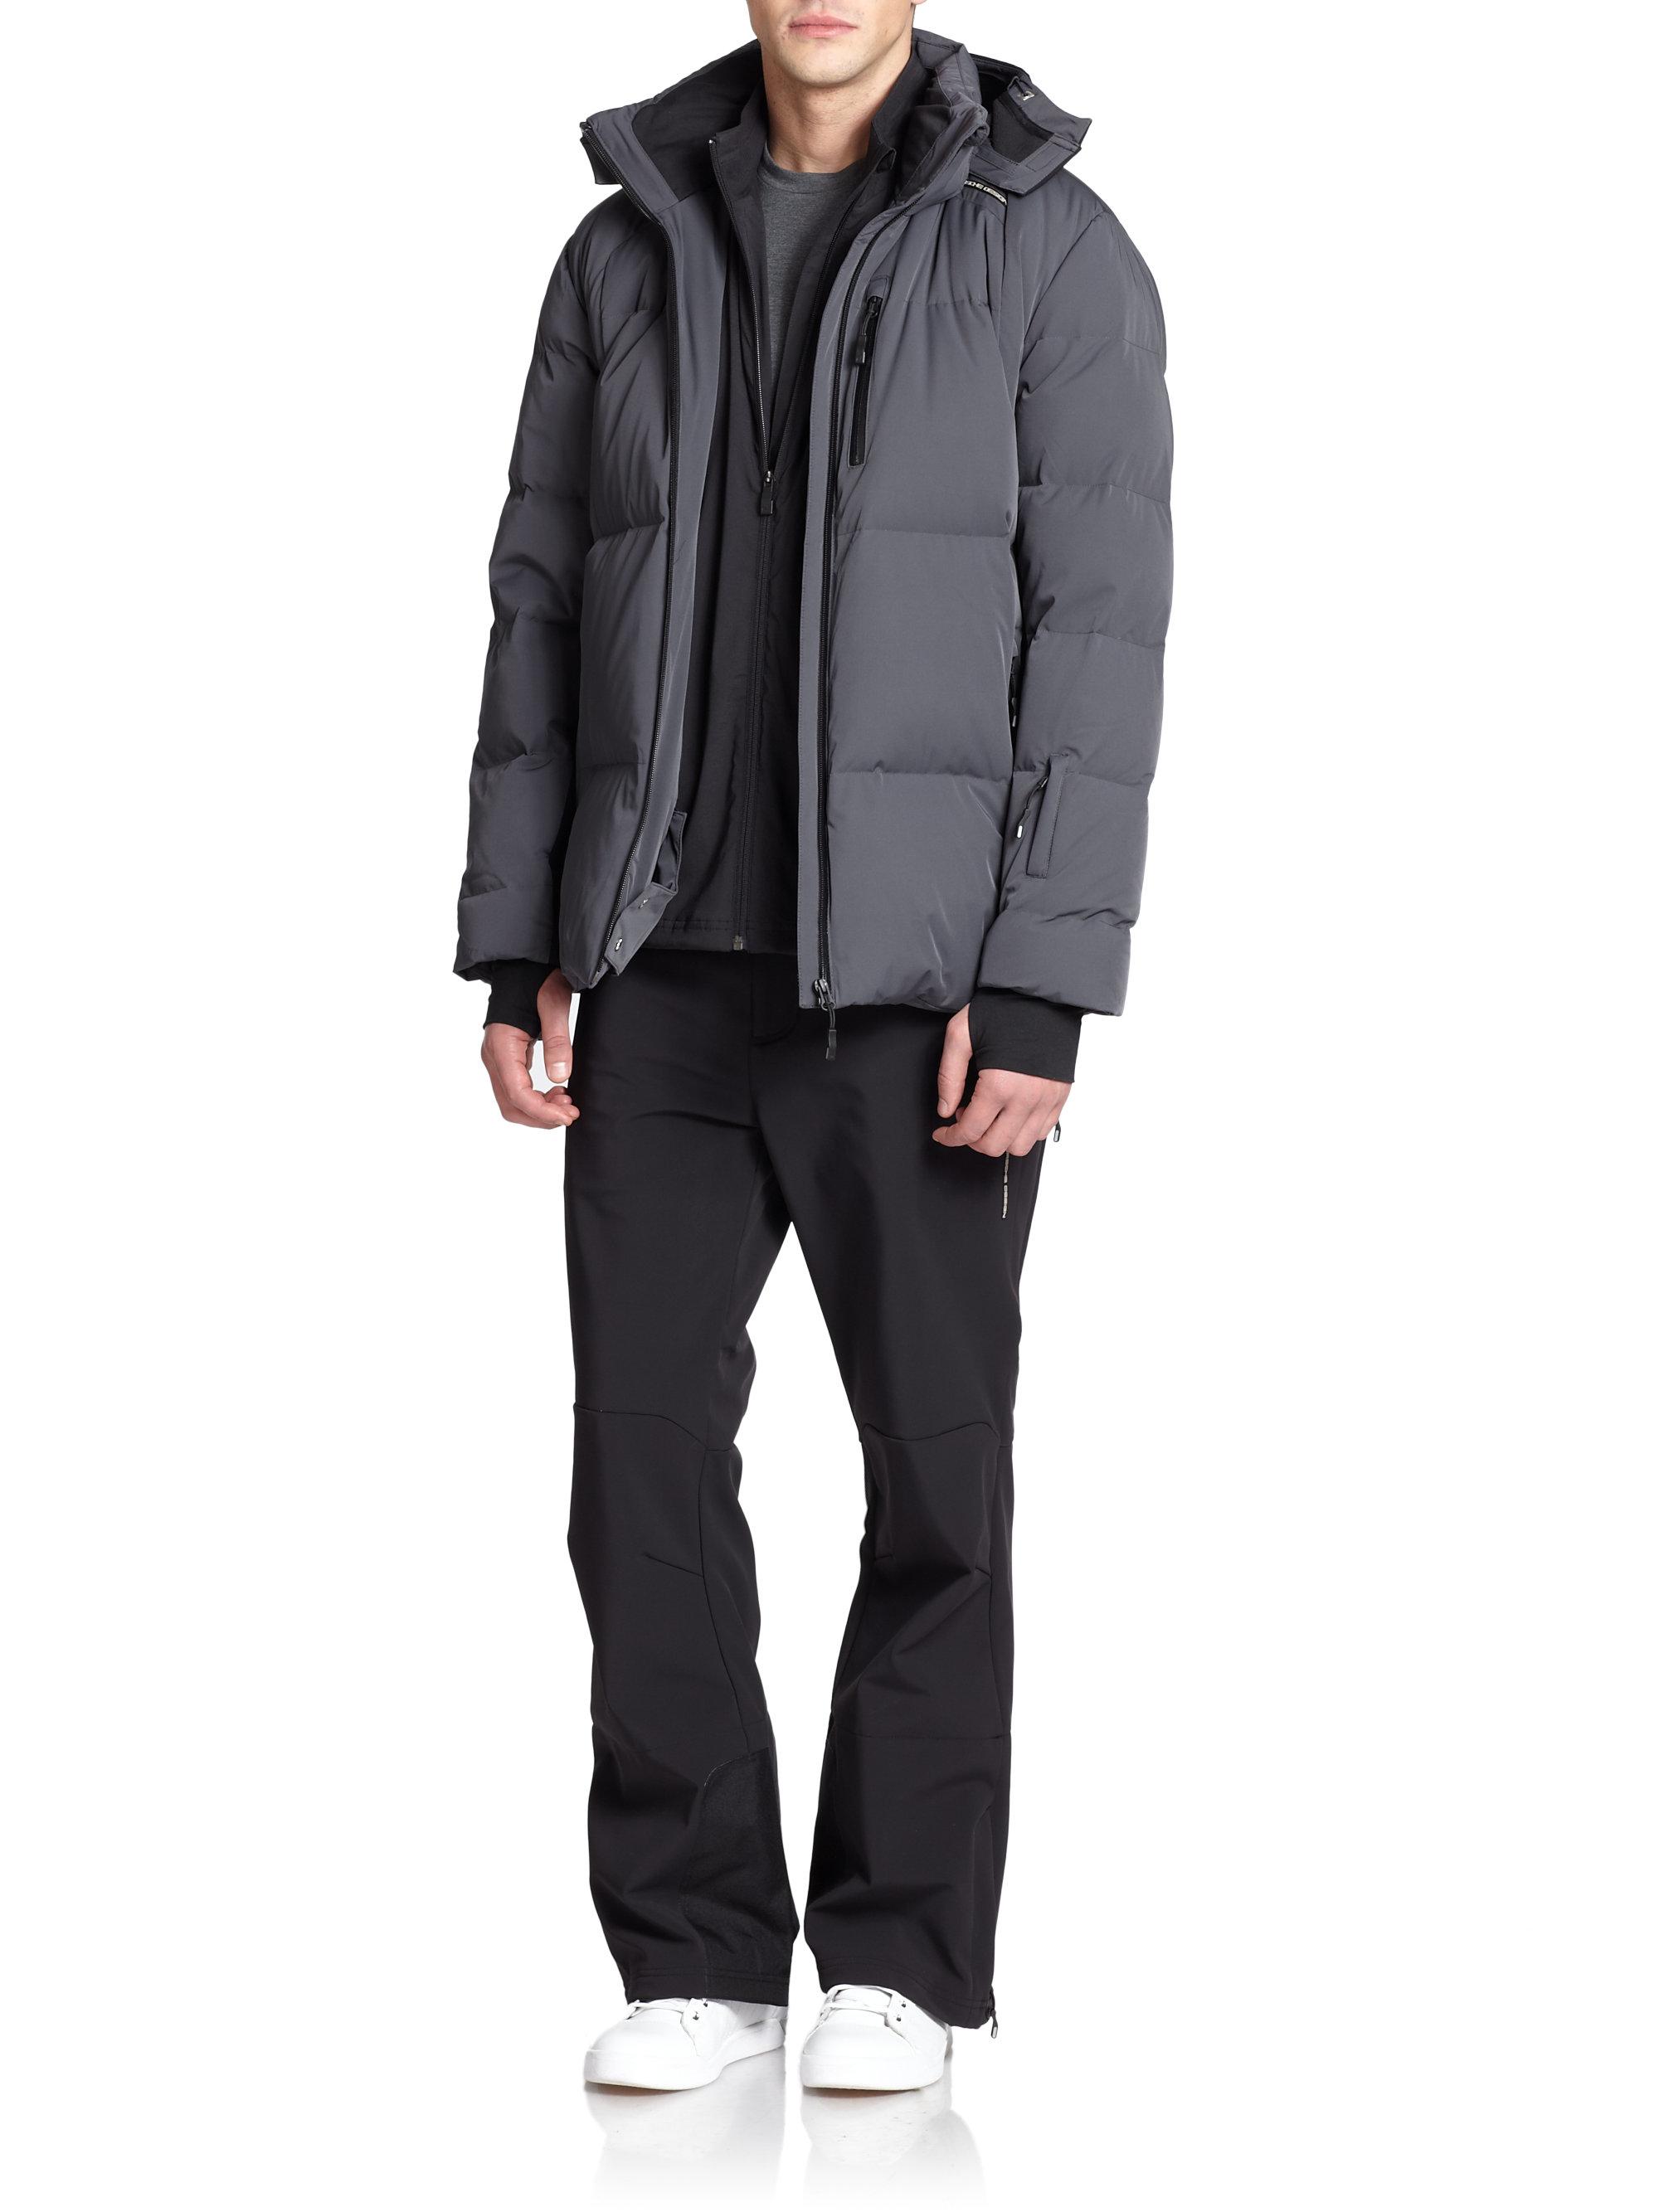 on sale 35d87 69f68 Lyst - Porsche Design Down Ski Jacket in Gray for Men